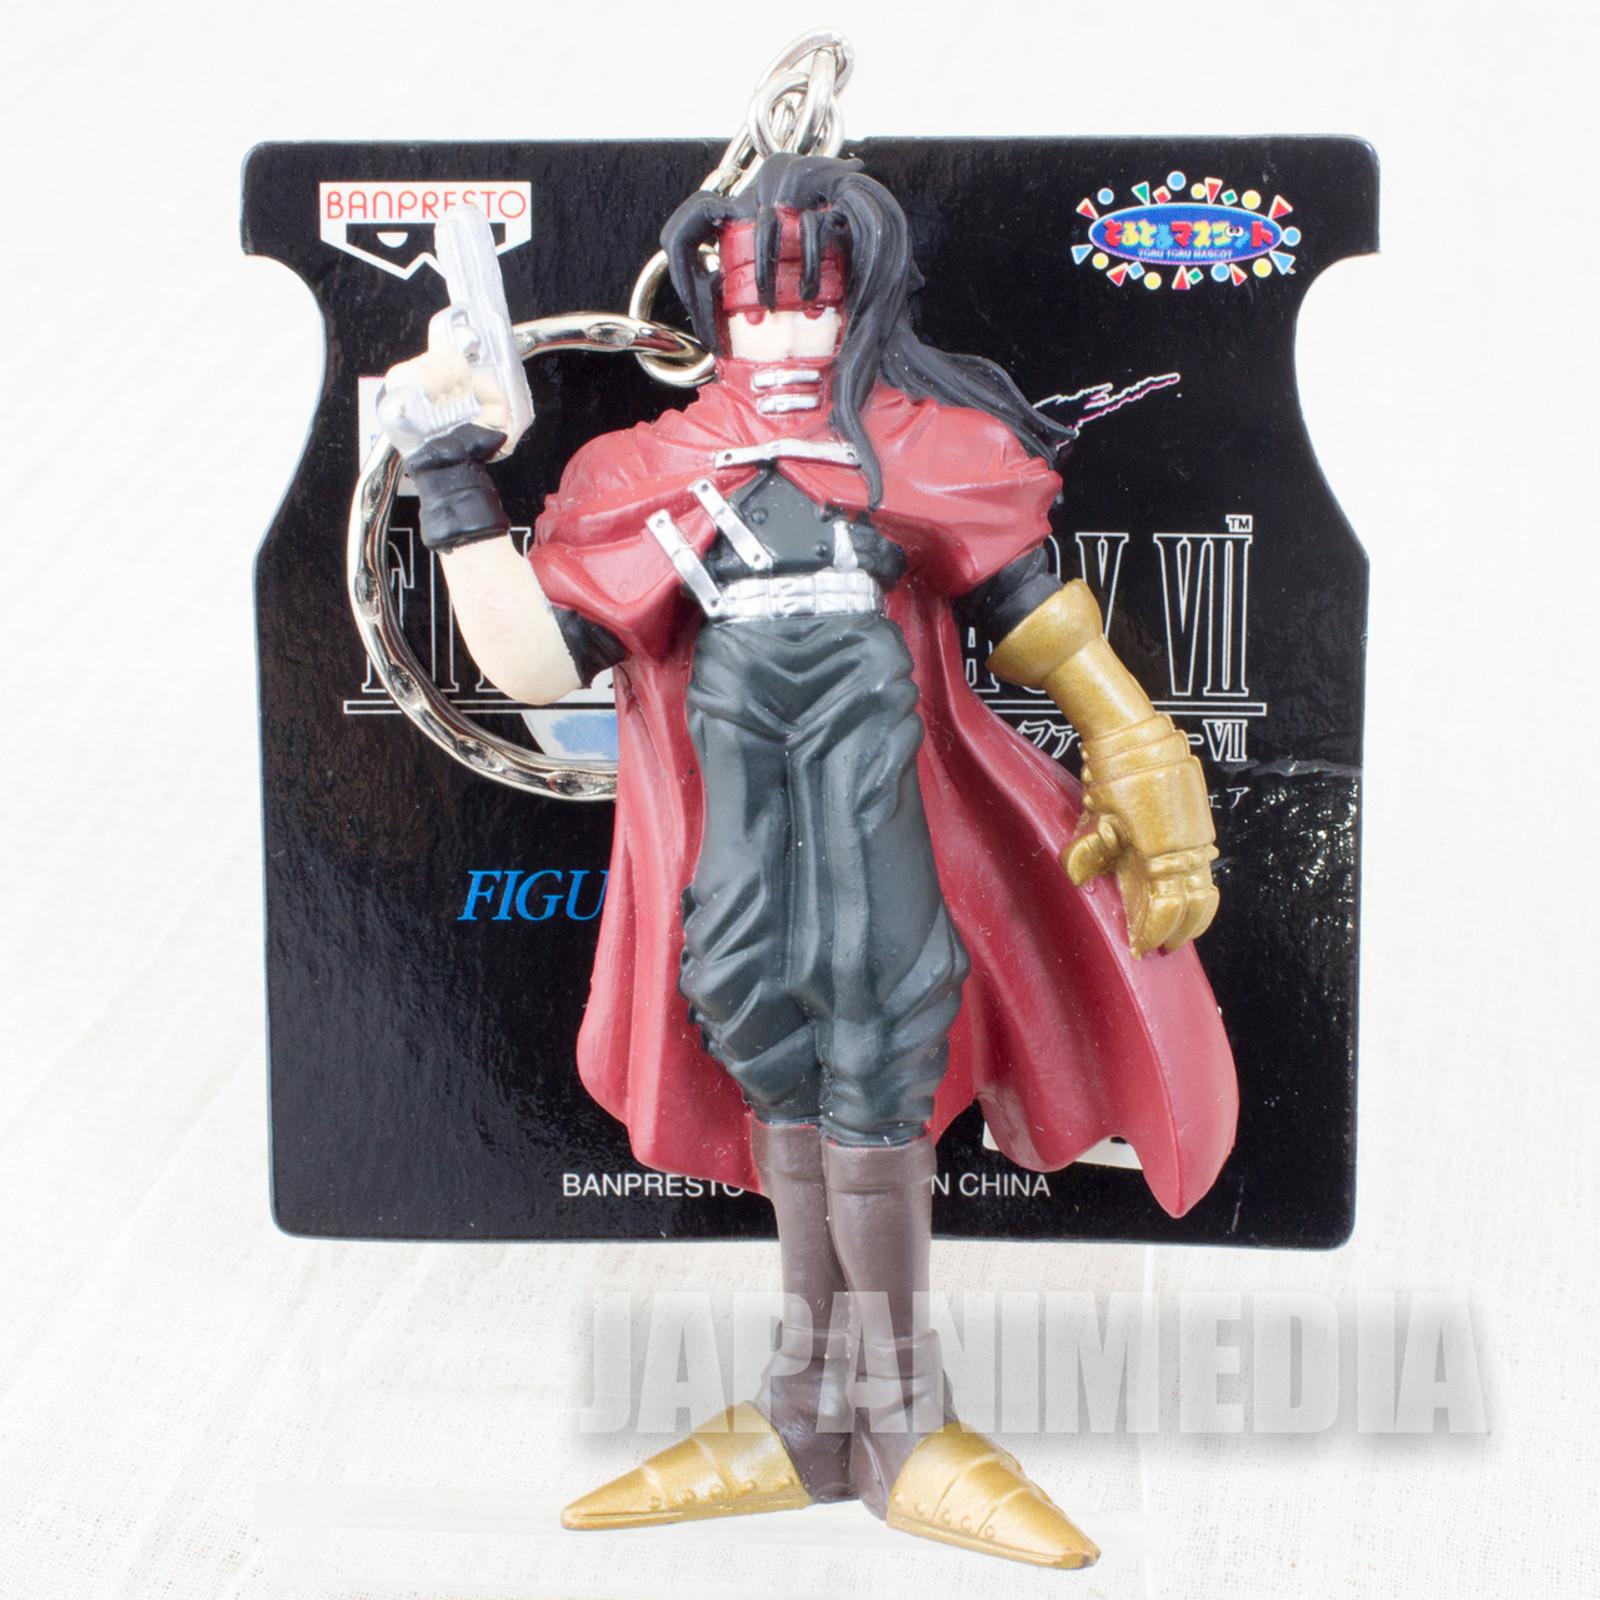 Final Fantasy VII Vincent Valentine Figure Key Chain Banpresto JAPAN SQUARE ENIX